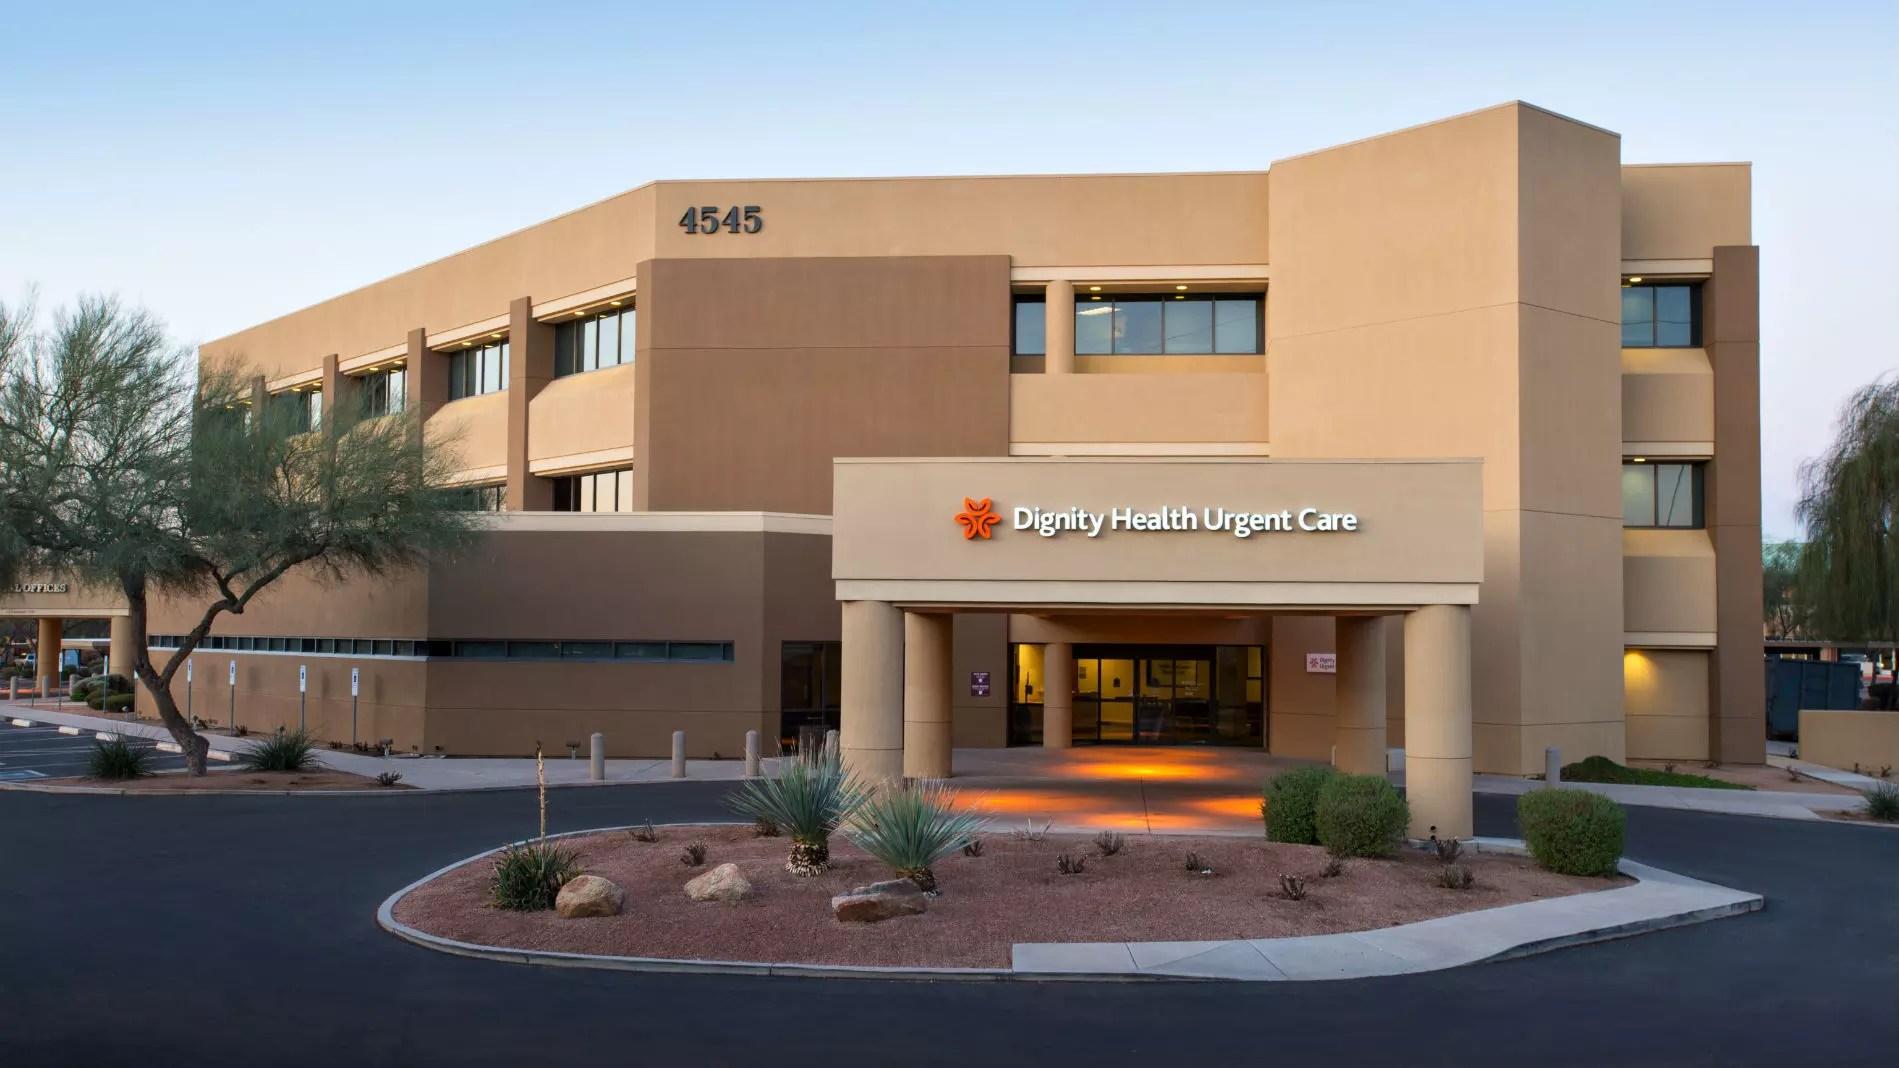 Dignity Health Urgent Care in Ahwatukee  Phoenix AZ